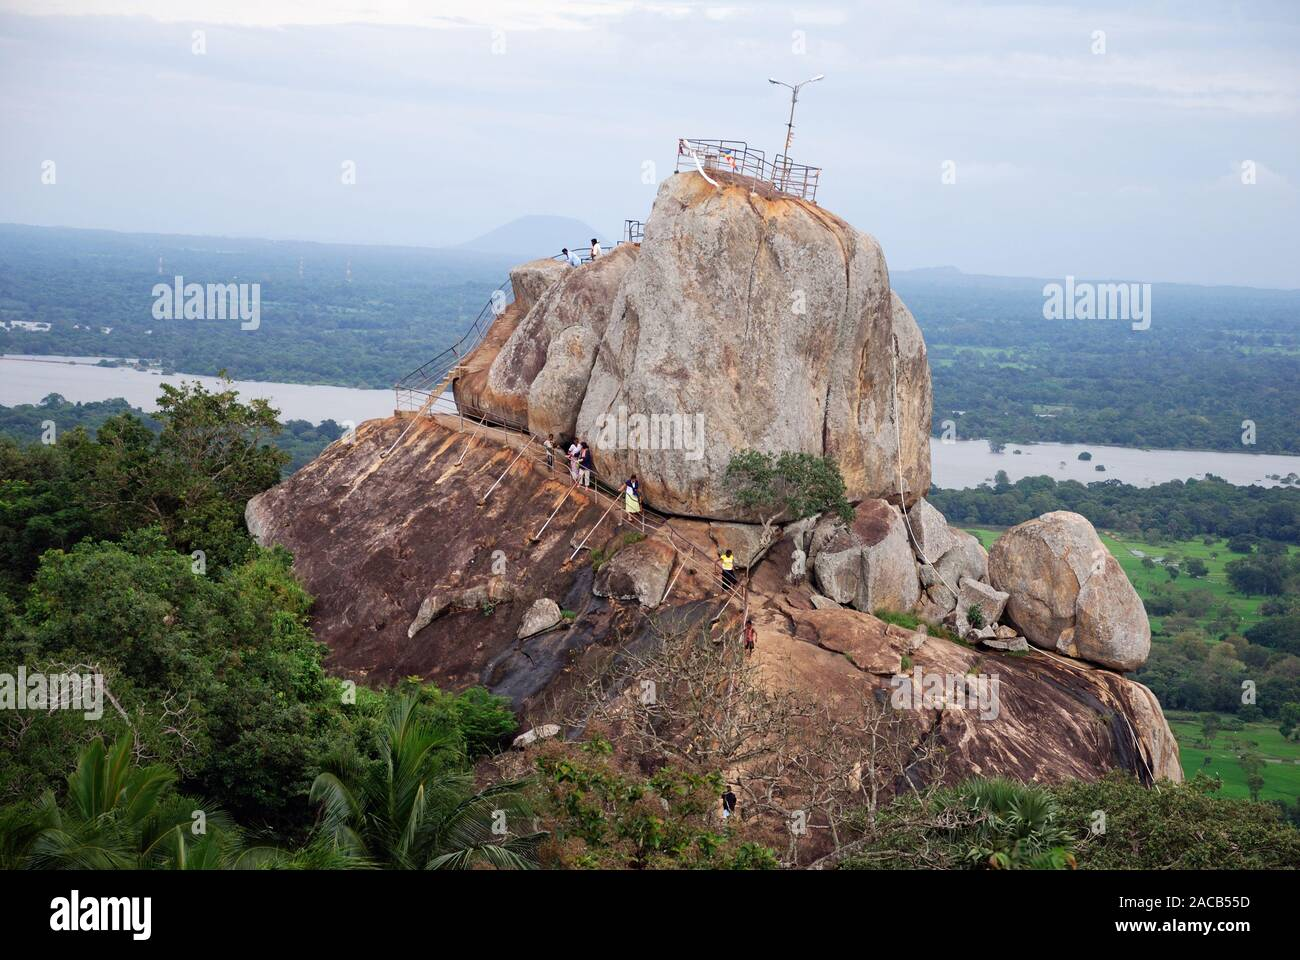 Temple, Sila Rock, Silafelsen, Mihintale, Sri Lanka, Asia Stock Photo